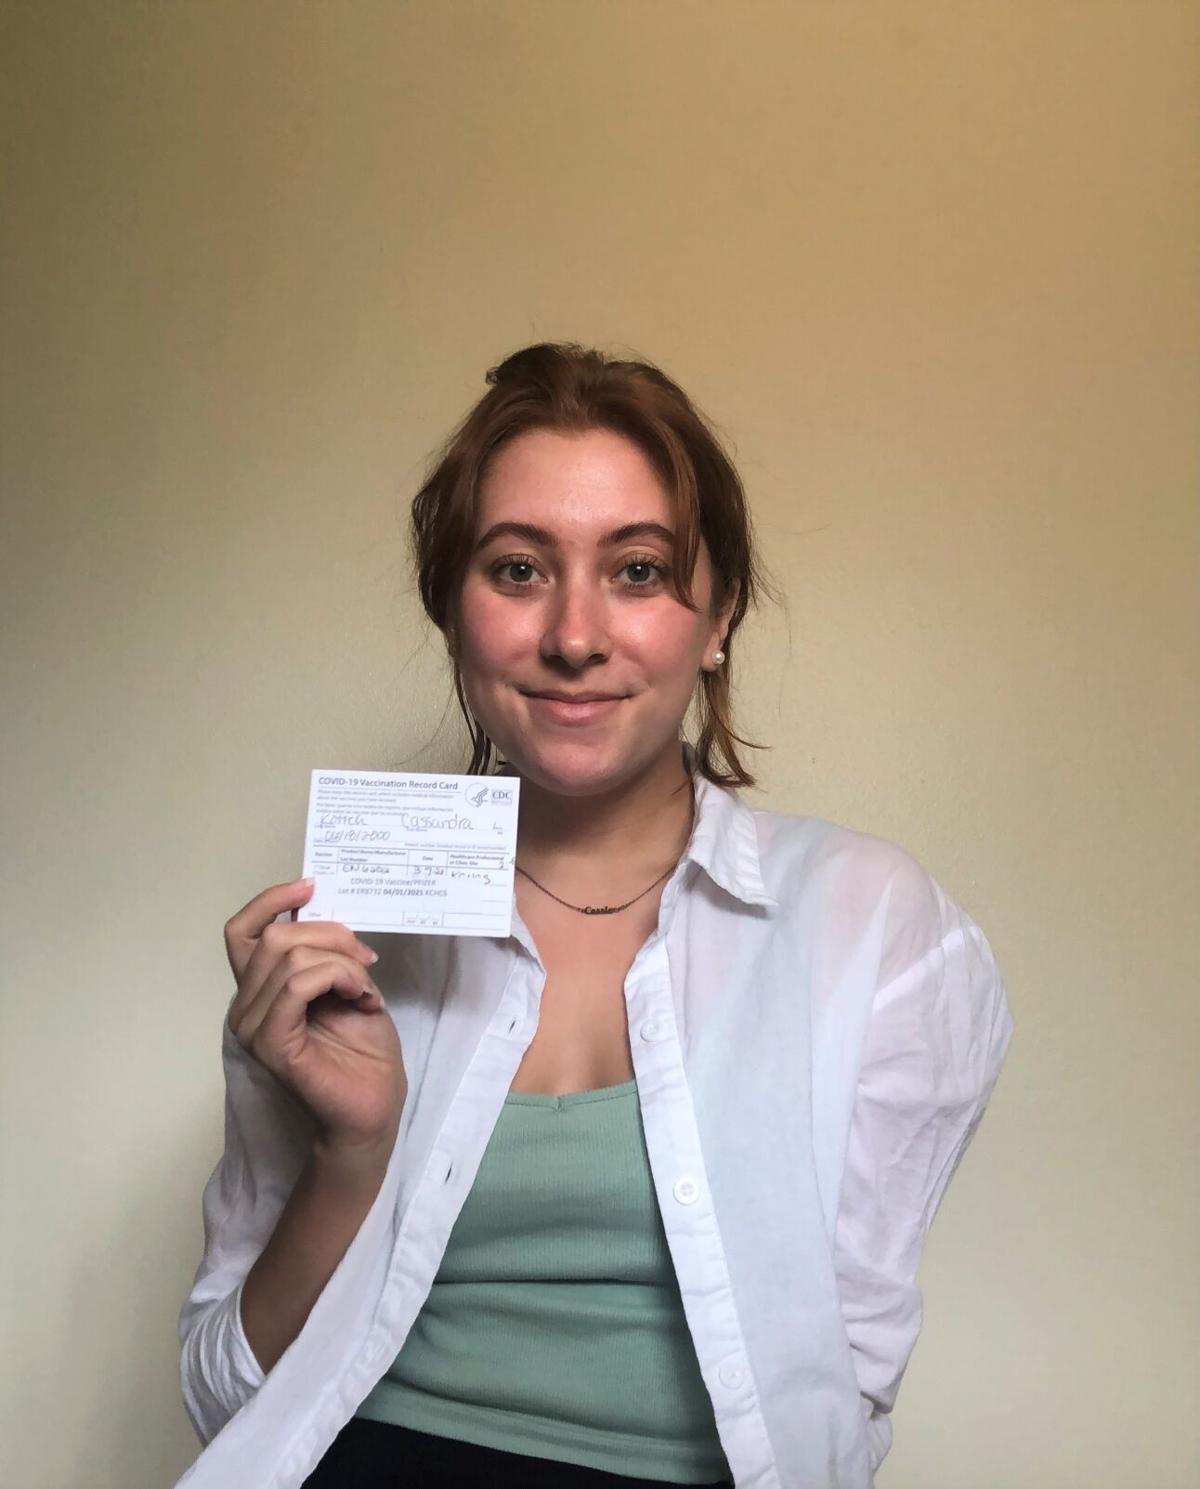 Cassie Kotrch Vaccination Card